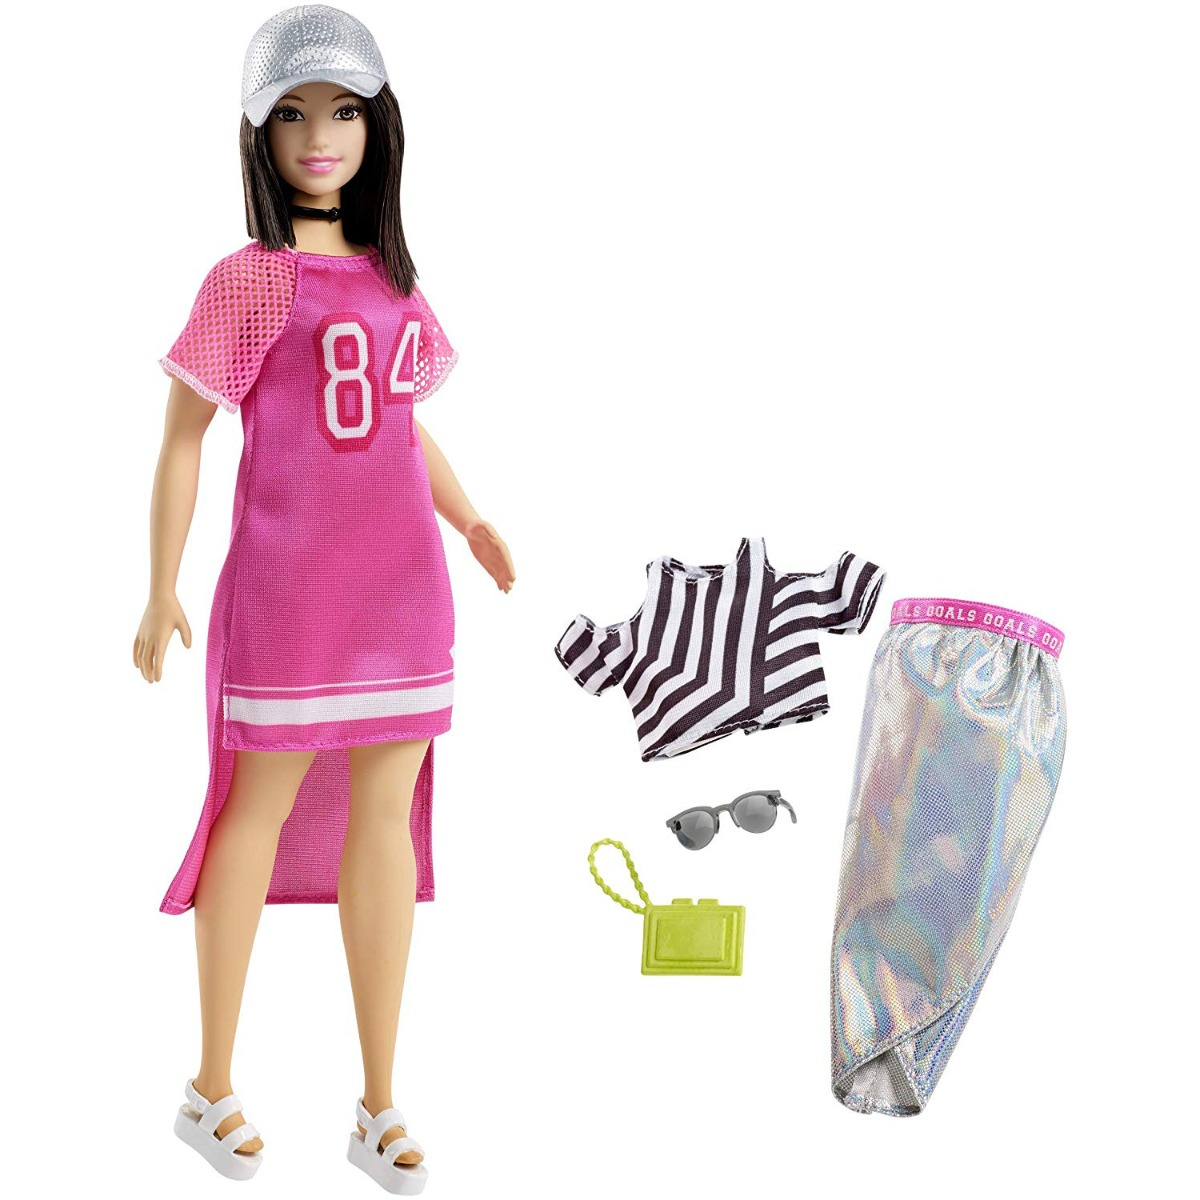 Papusa Barbie Fashionistas 101, Sporty Chic, FRY81